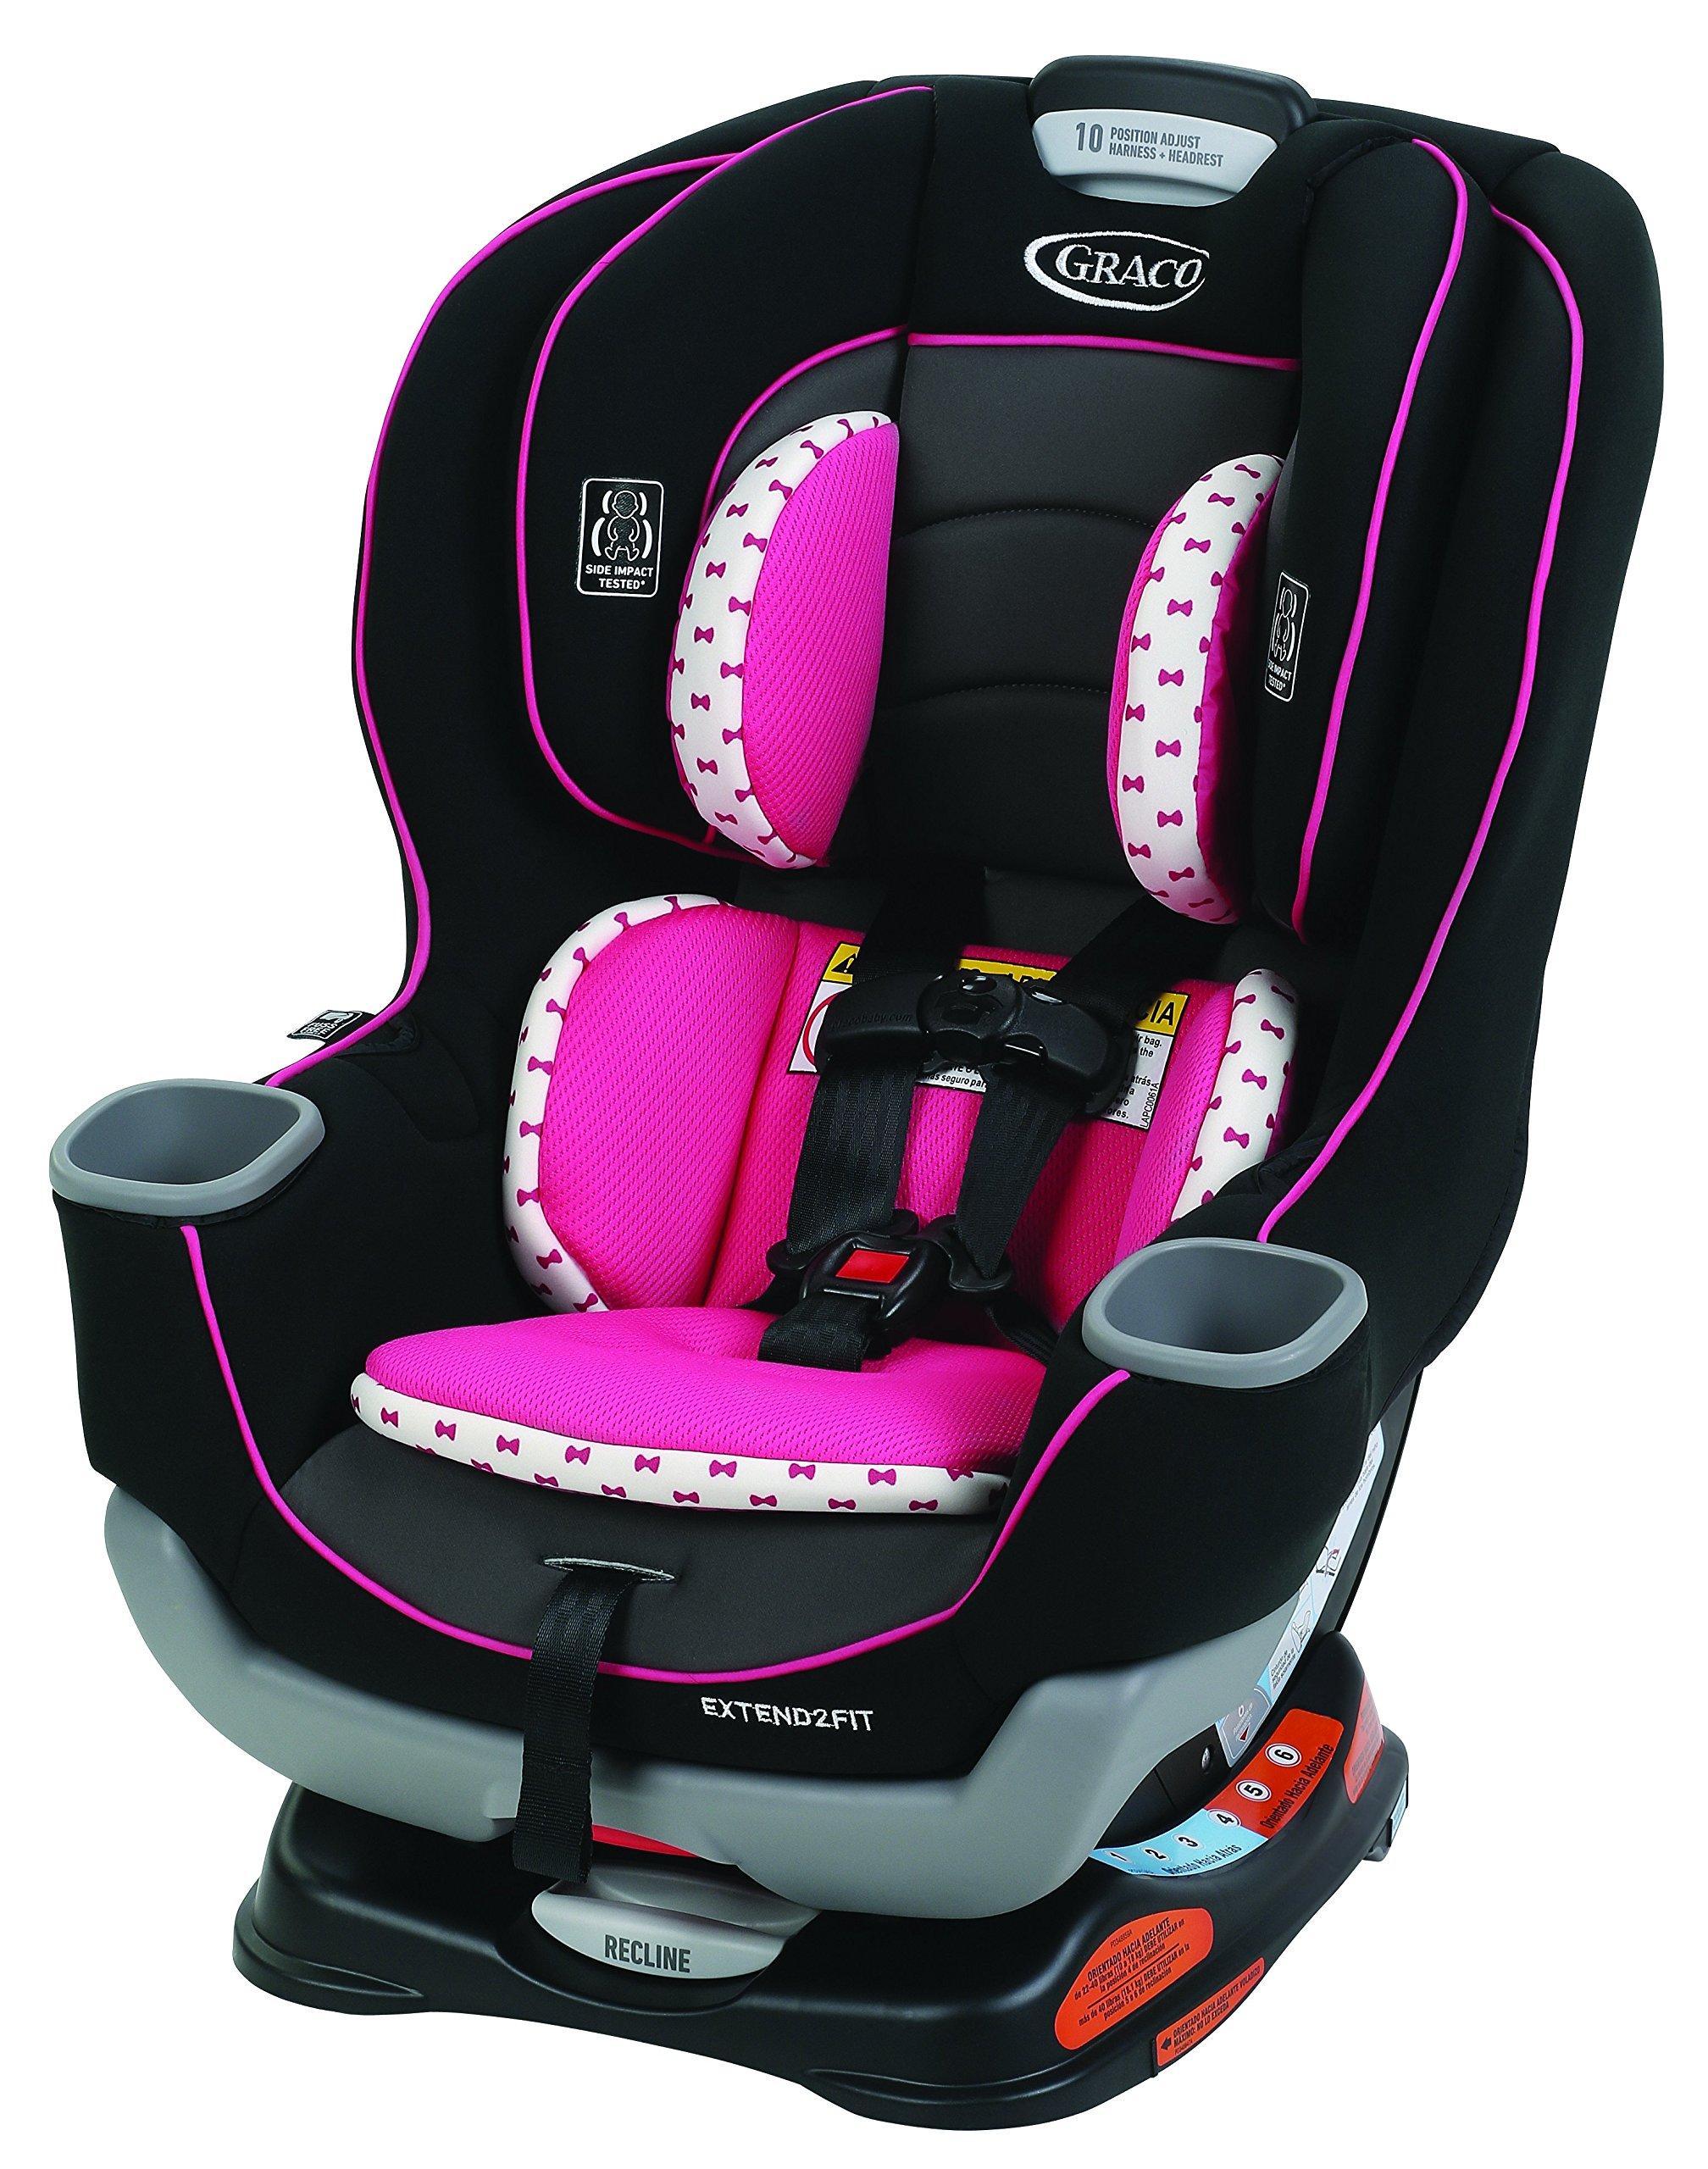 Graco Extend2Fit Convertible Car Seat, Kenzie